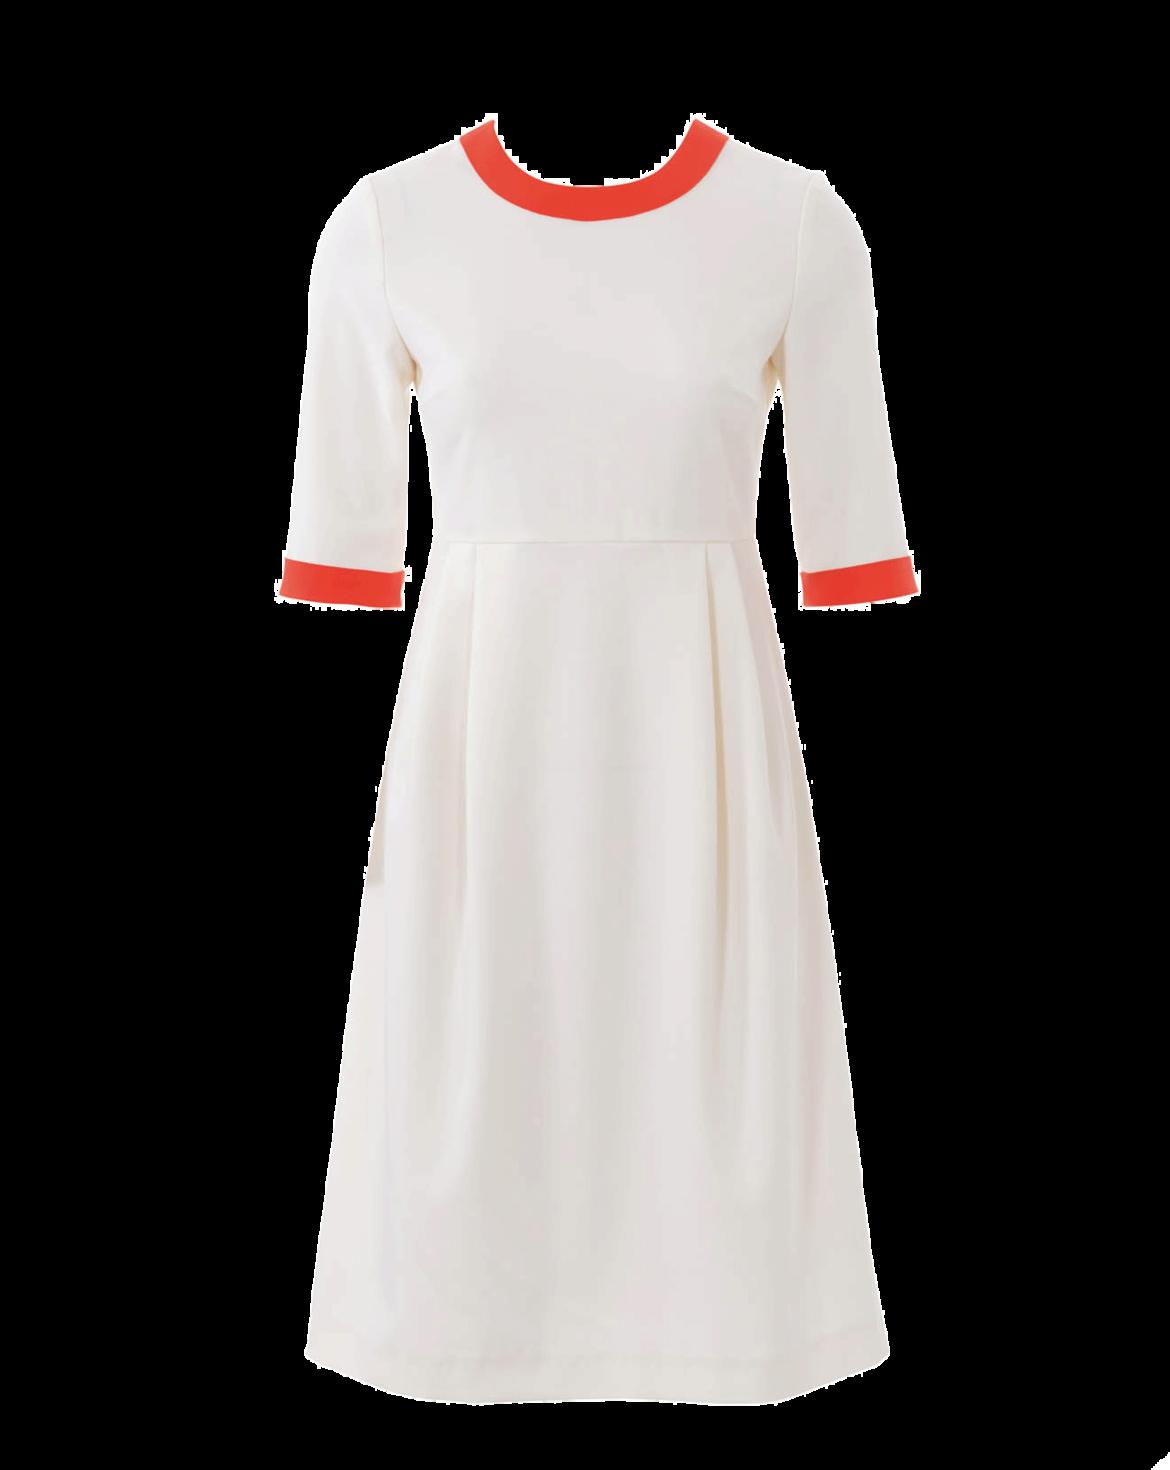 Schnittmuster Kleid 08/2015 #123   Nähen   Pinterest   Schnittmuster ...